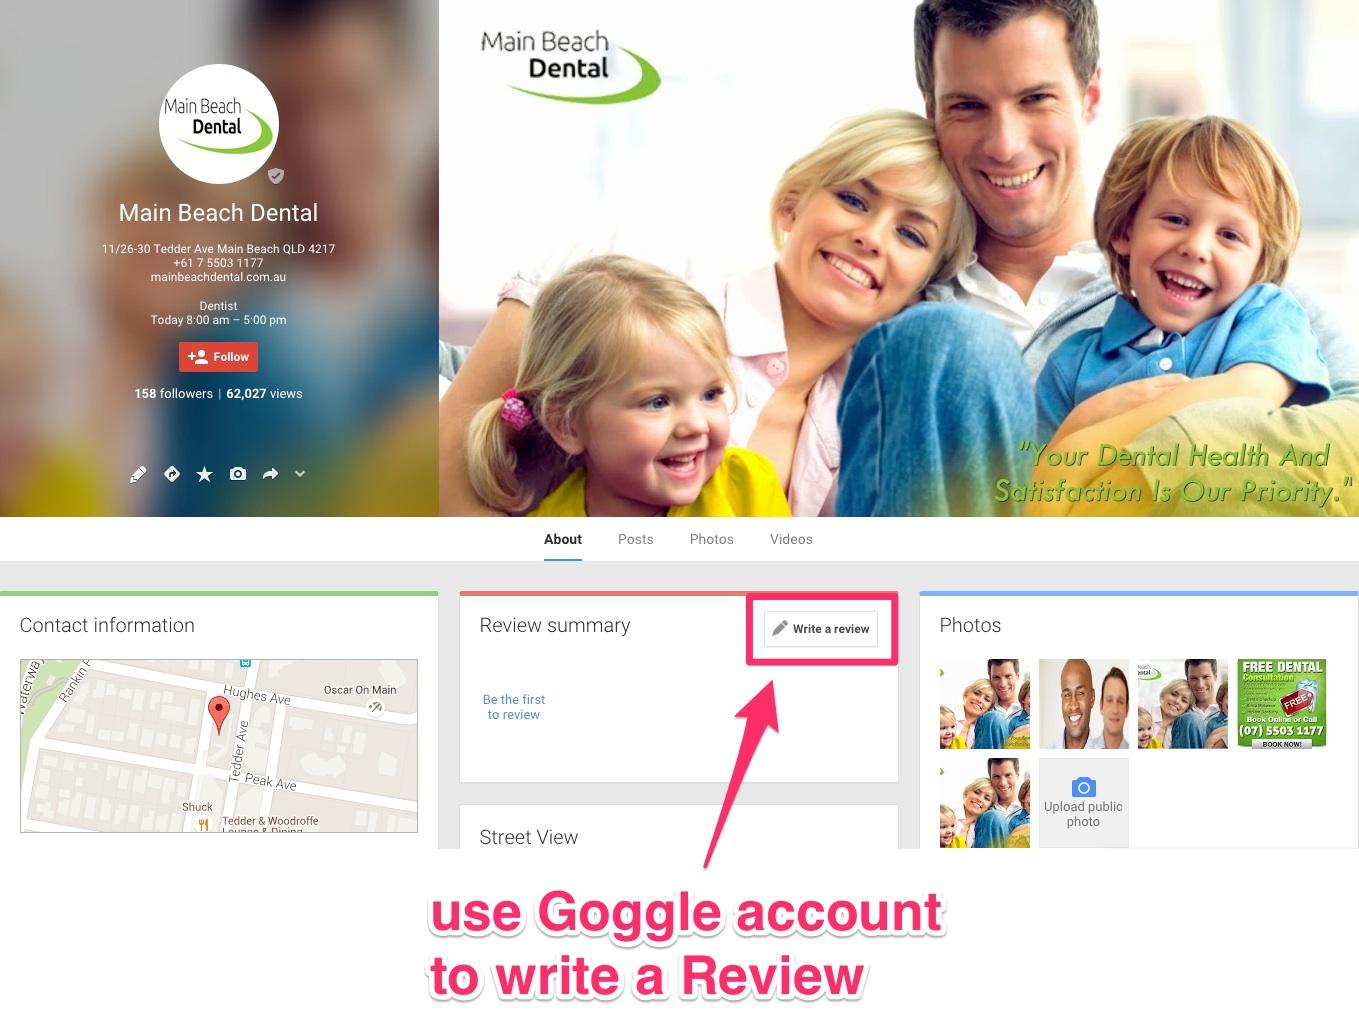 Main Beach Dental - About - Google